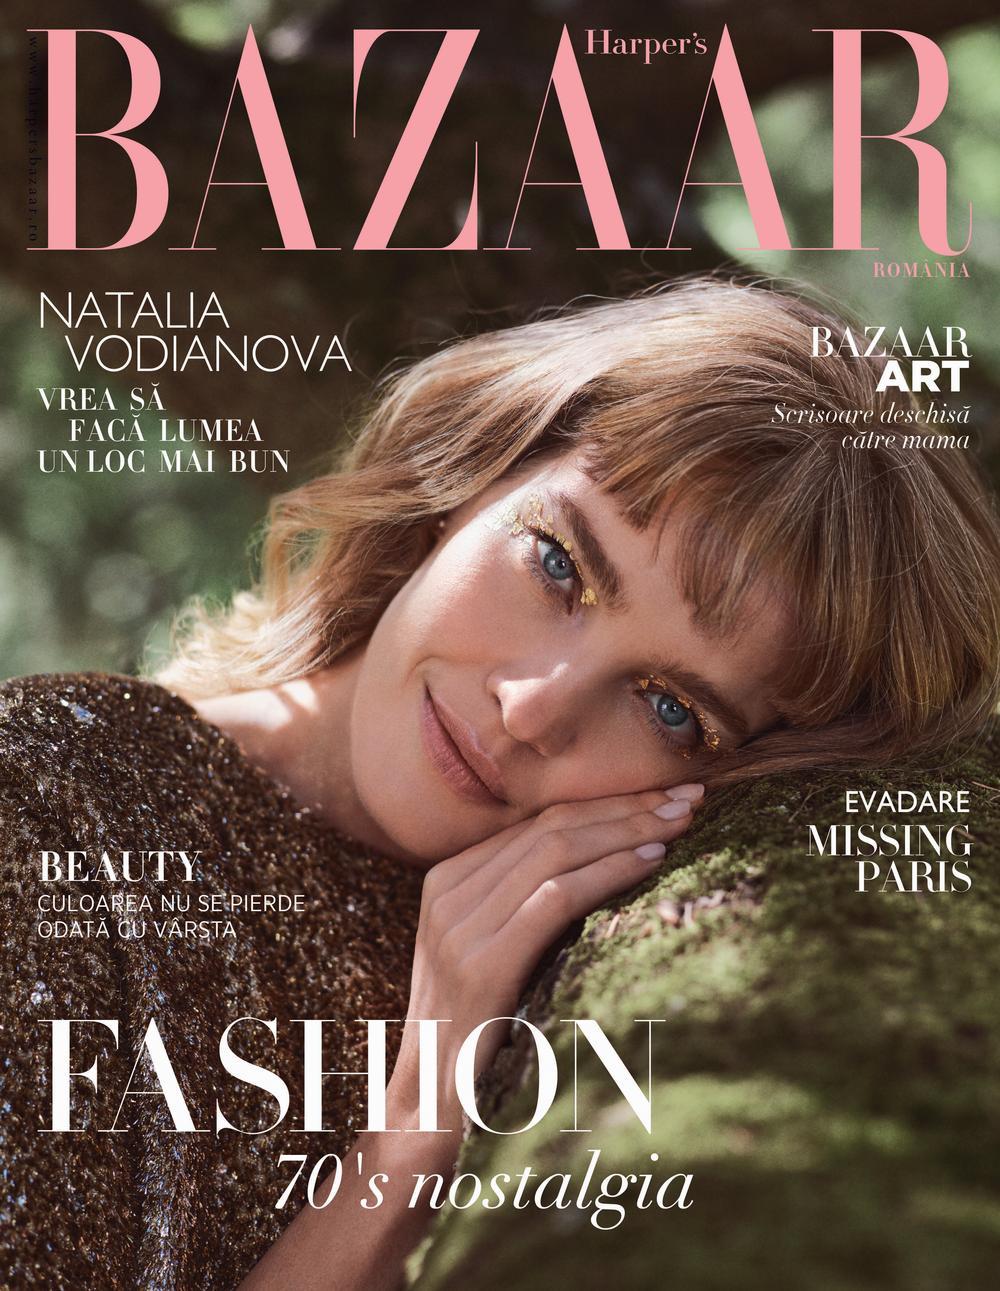 Harpers Bazaar nr 10